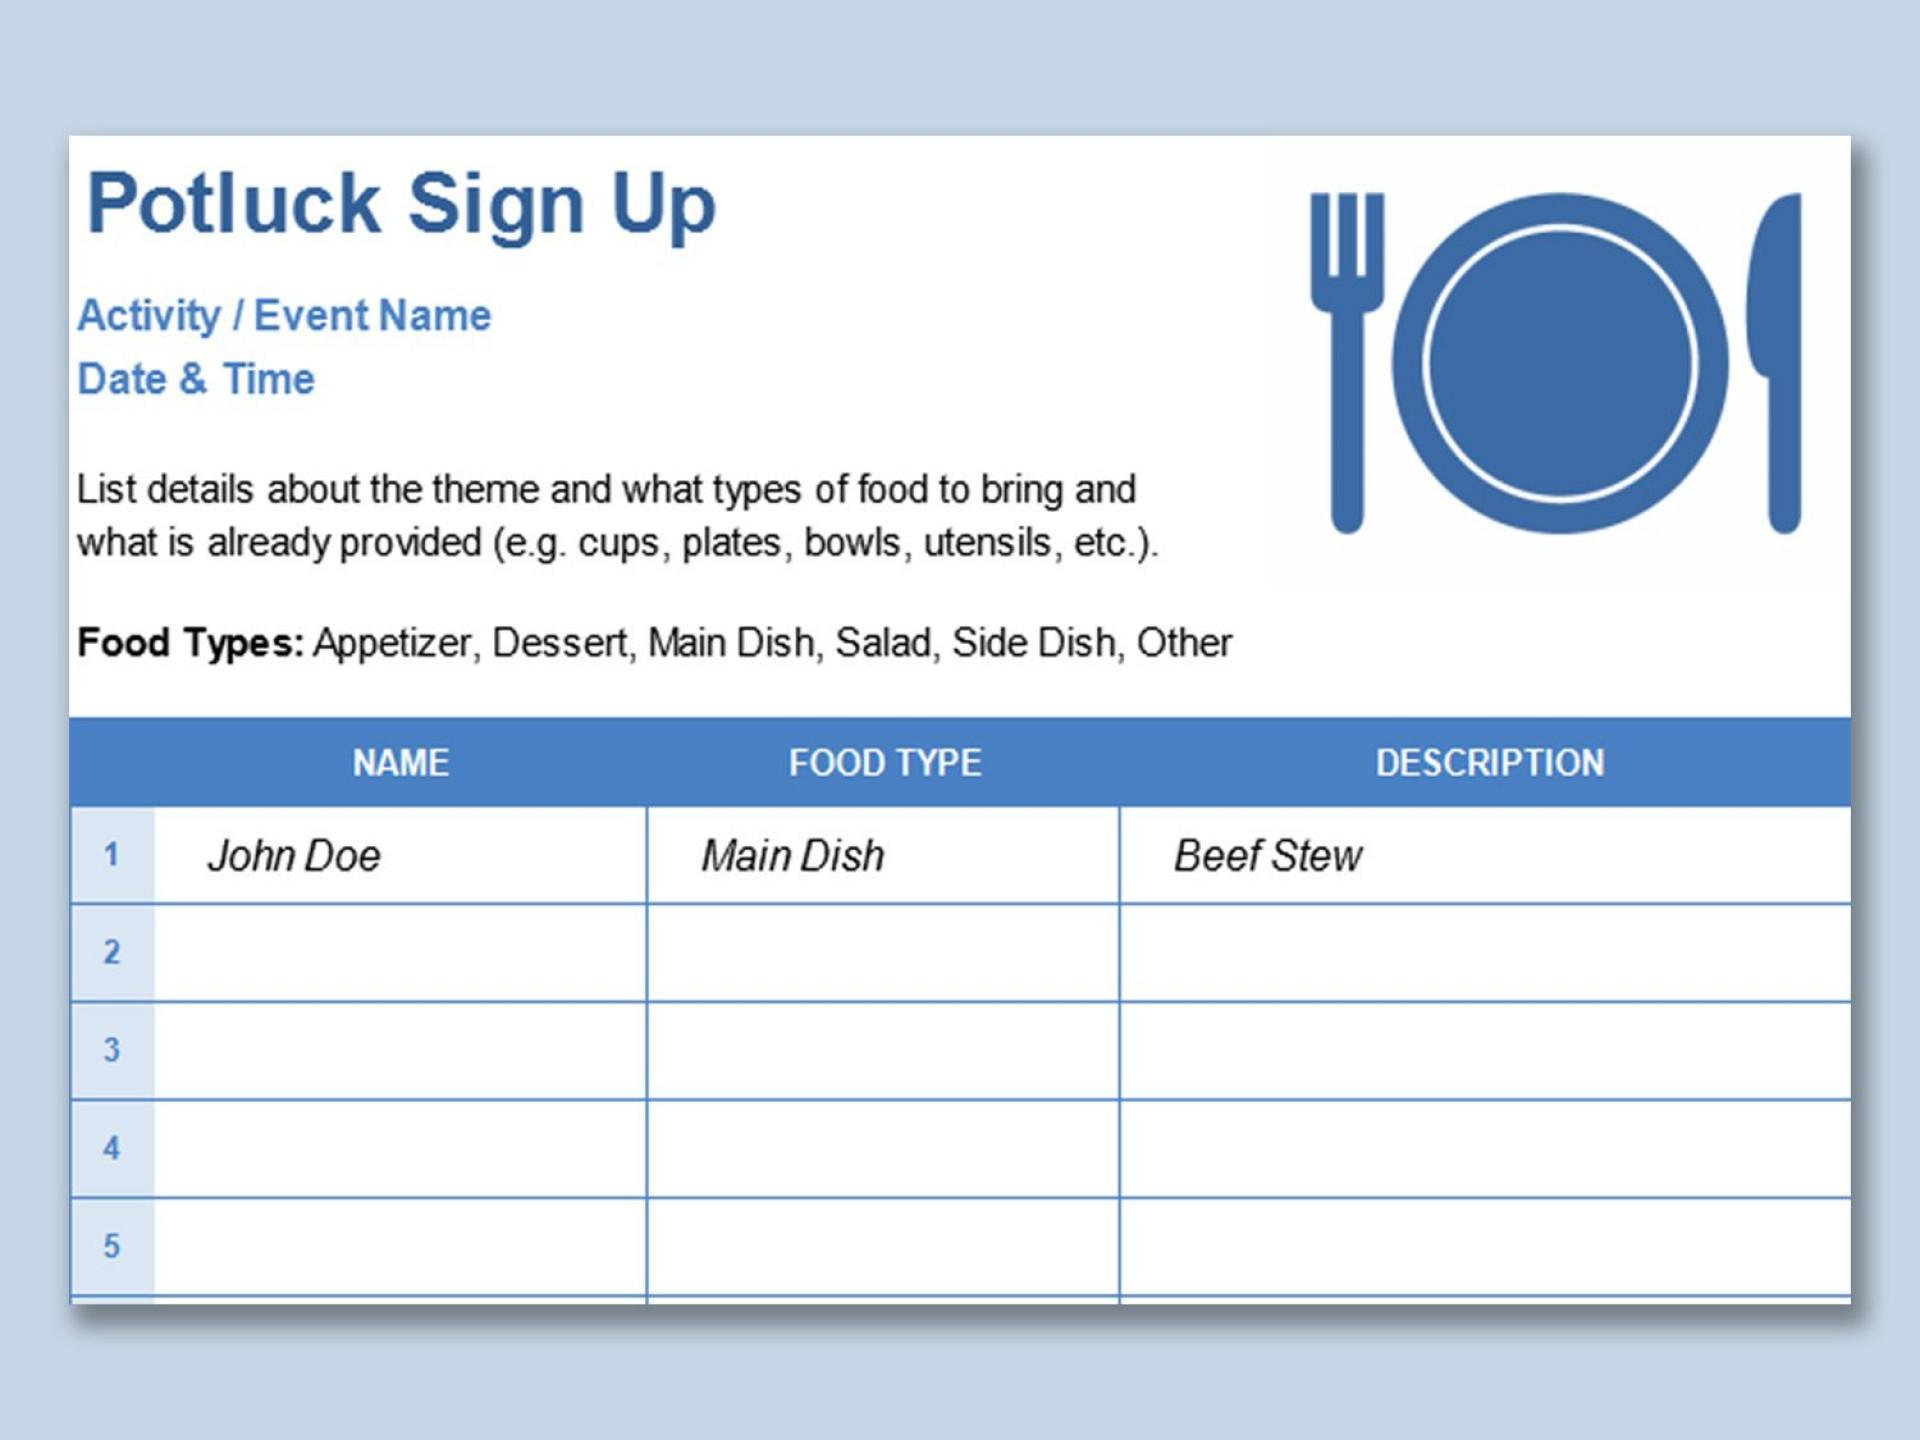 002 Wondrou Free Sign Up Sheet Template Highest Quality  Printable Potluck Word Blank Google Doc1920